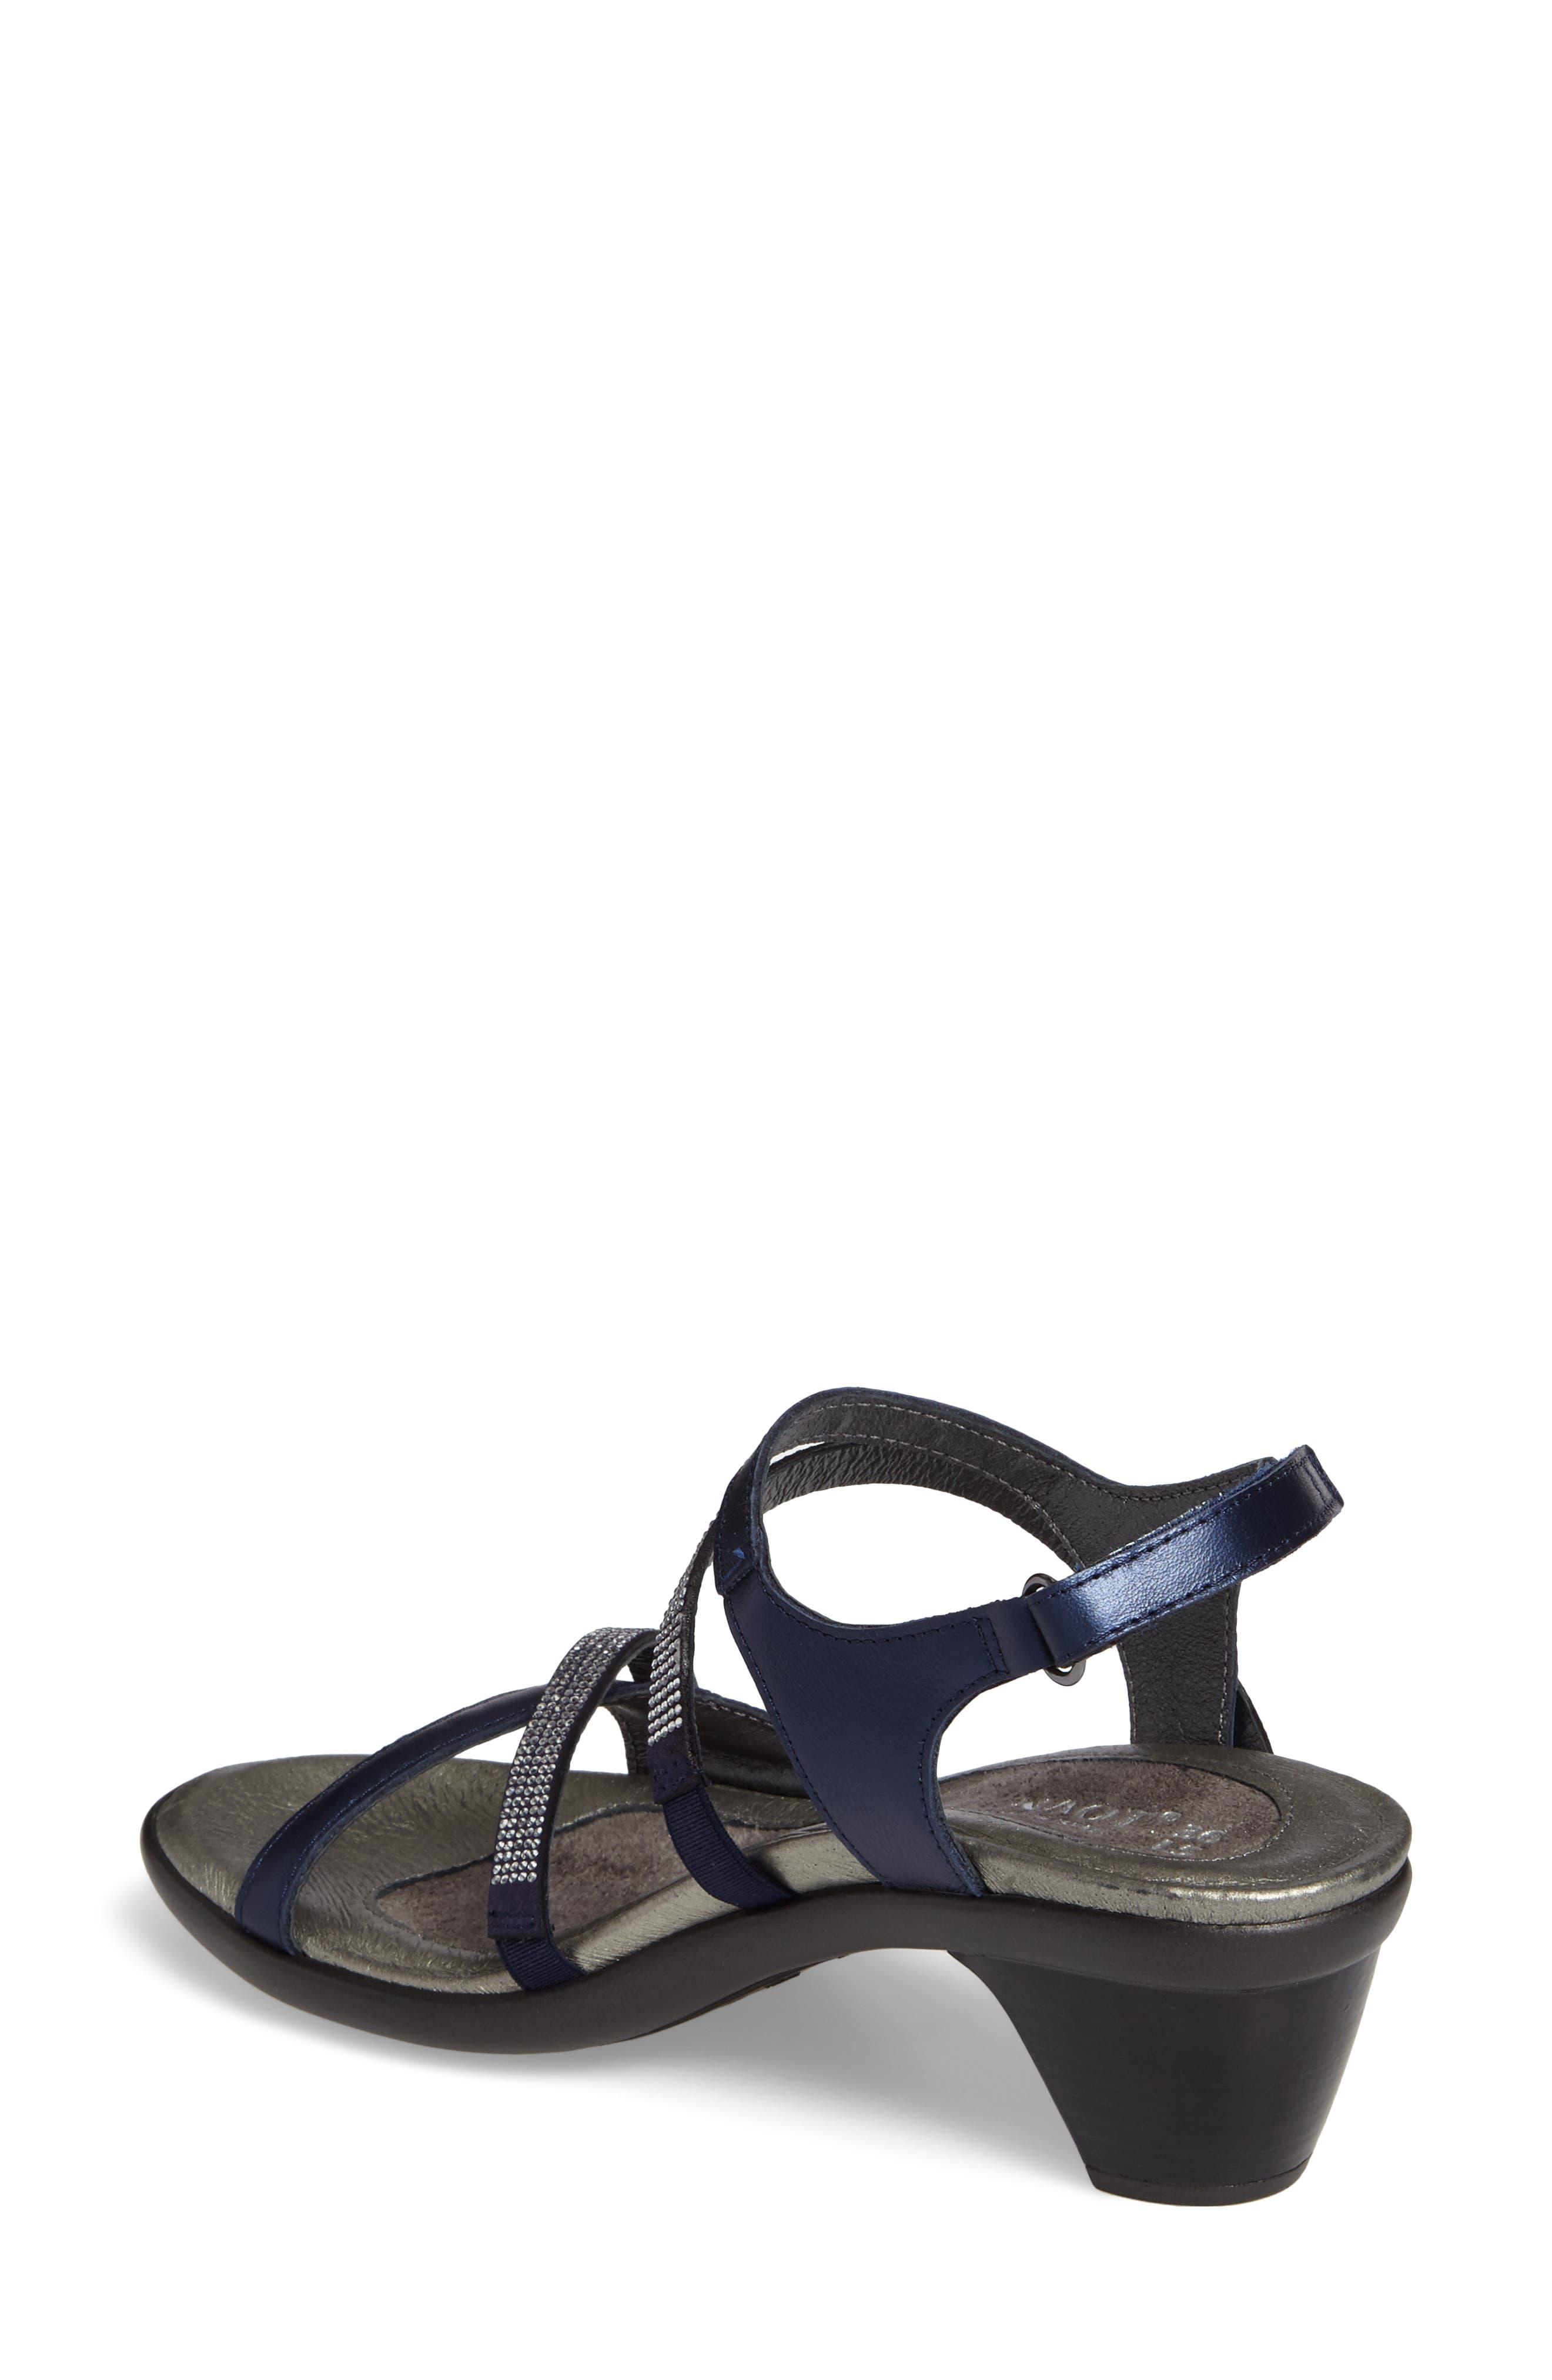 NAOT, Innovate Sandal, Alternate thumbnail 2, color, POLAR SEAL LEATHER